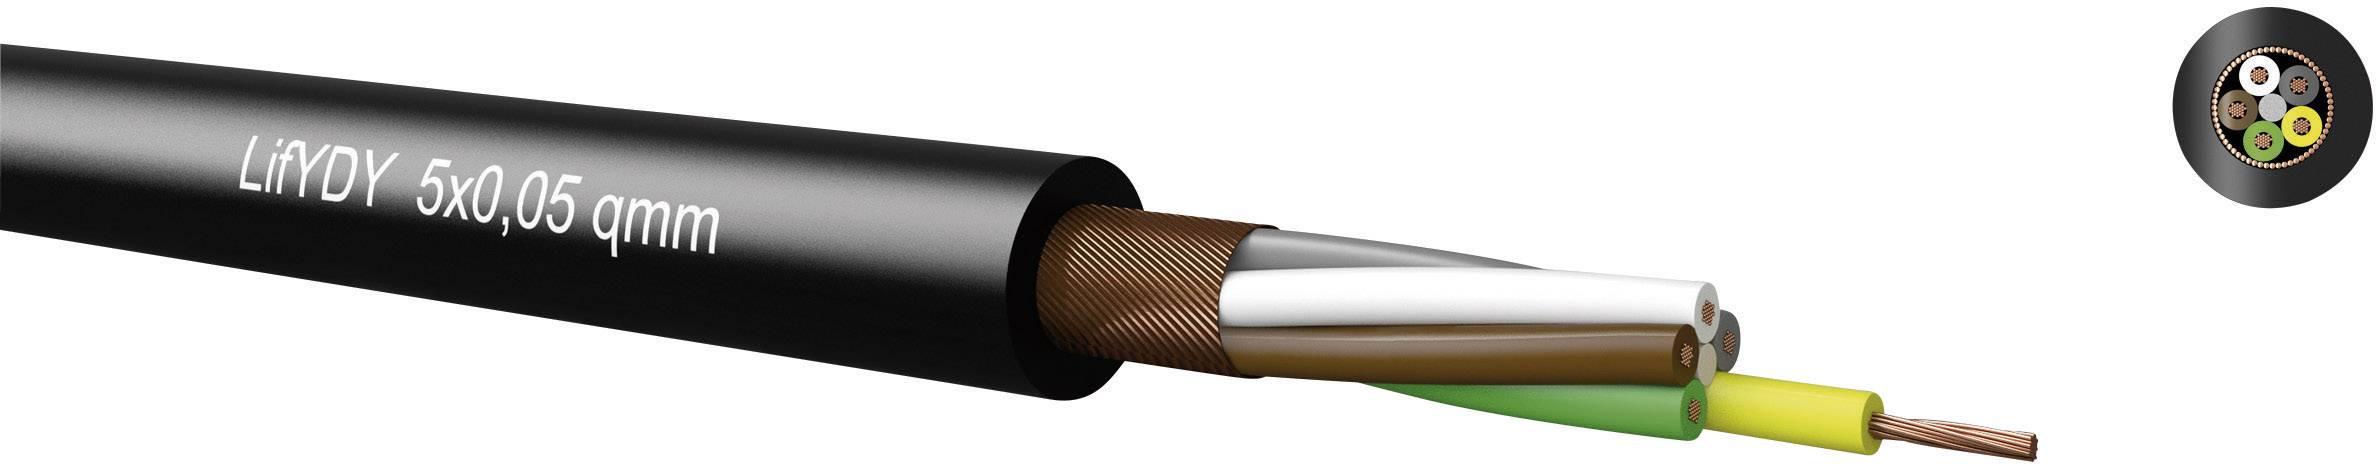 Riadiaci kábel Kabeltronik LifYDY 341600500, 16 x 0.05 mm², vonkajší Ø 4.80 mm, 100 V, metrový tovar, čierna